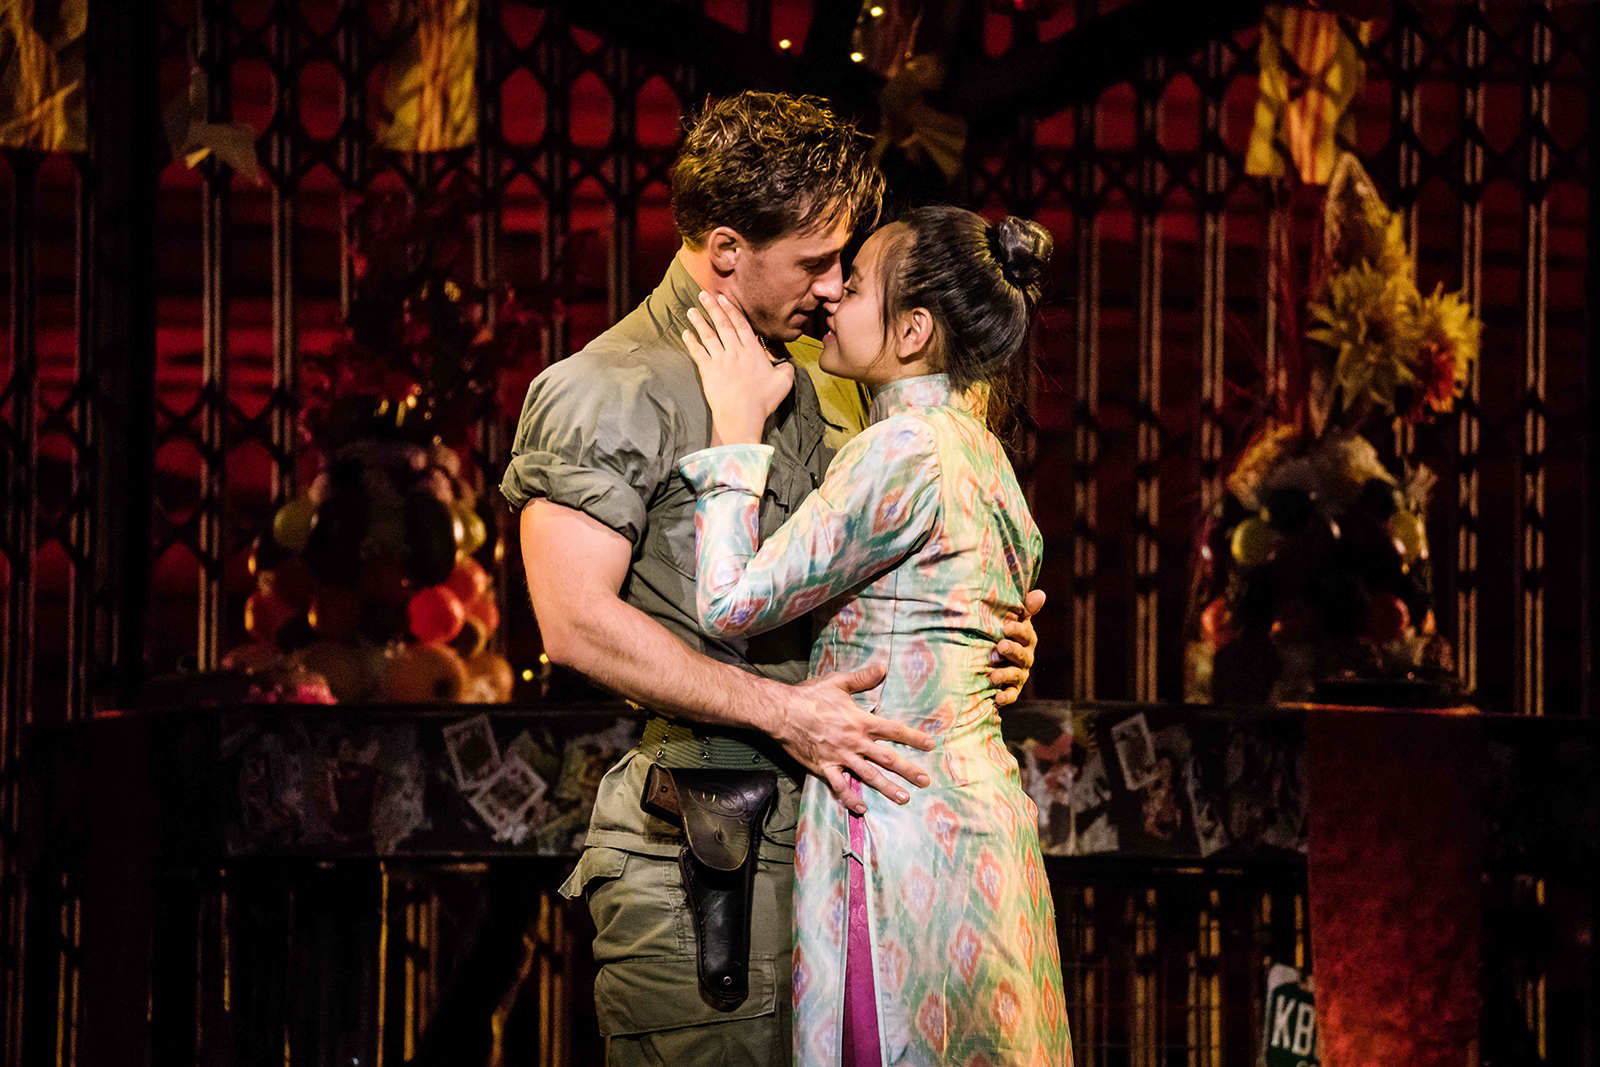 Ms Saigon kissing scene